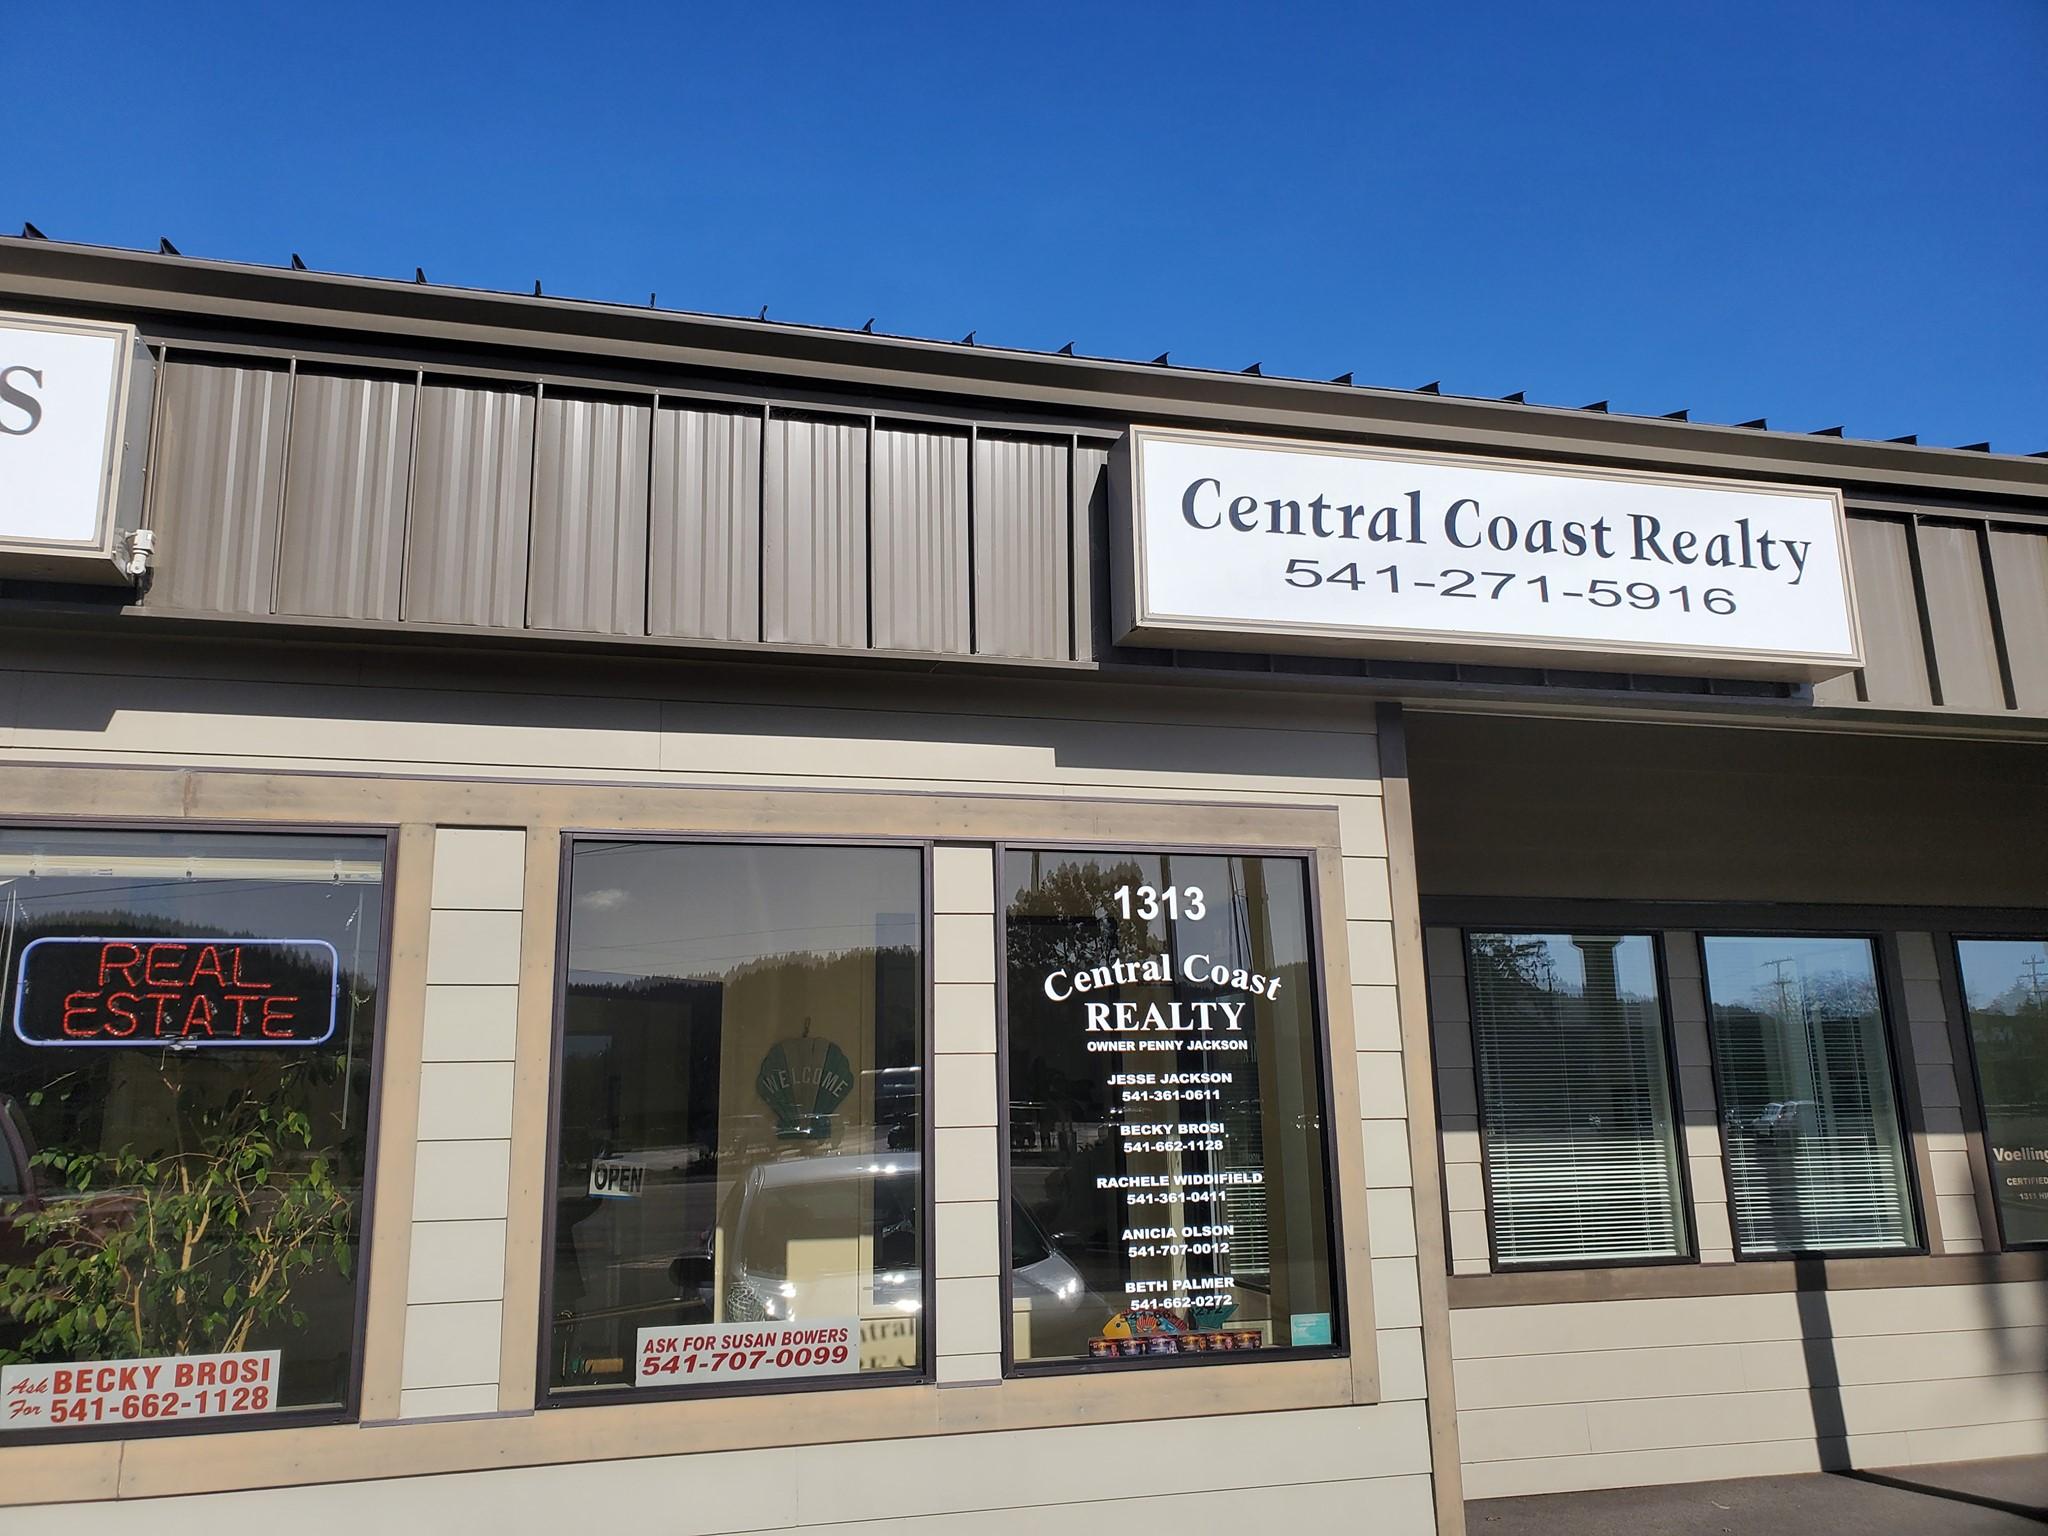 Central Coast Realty.jpg